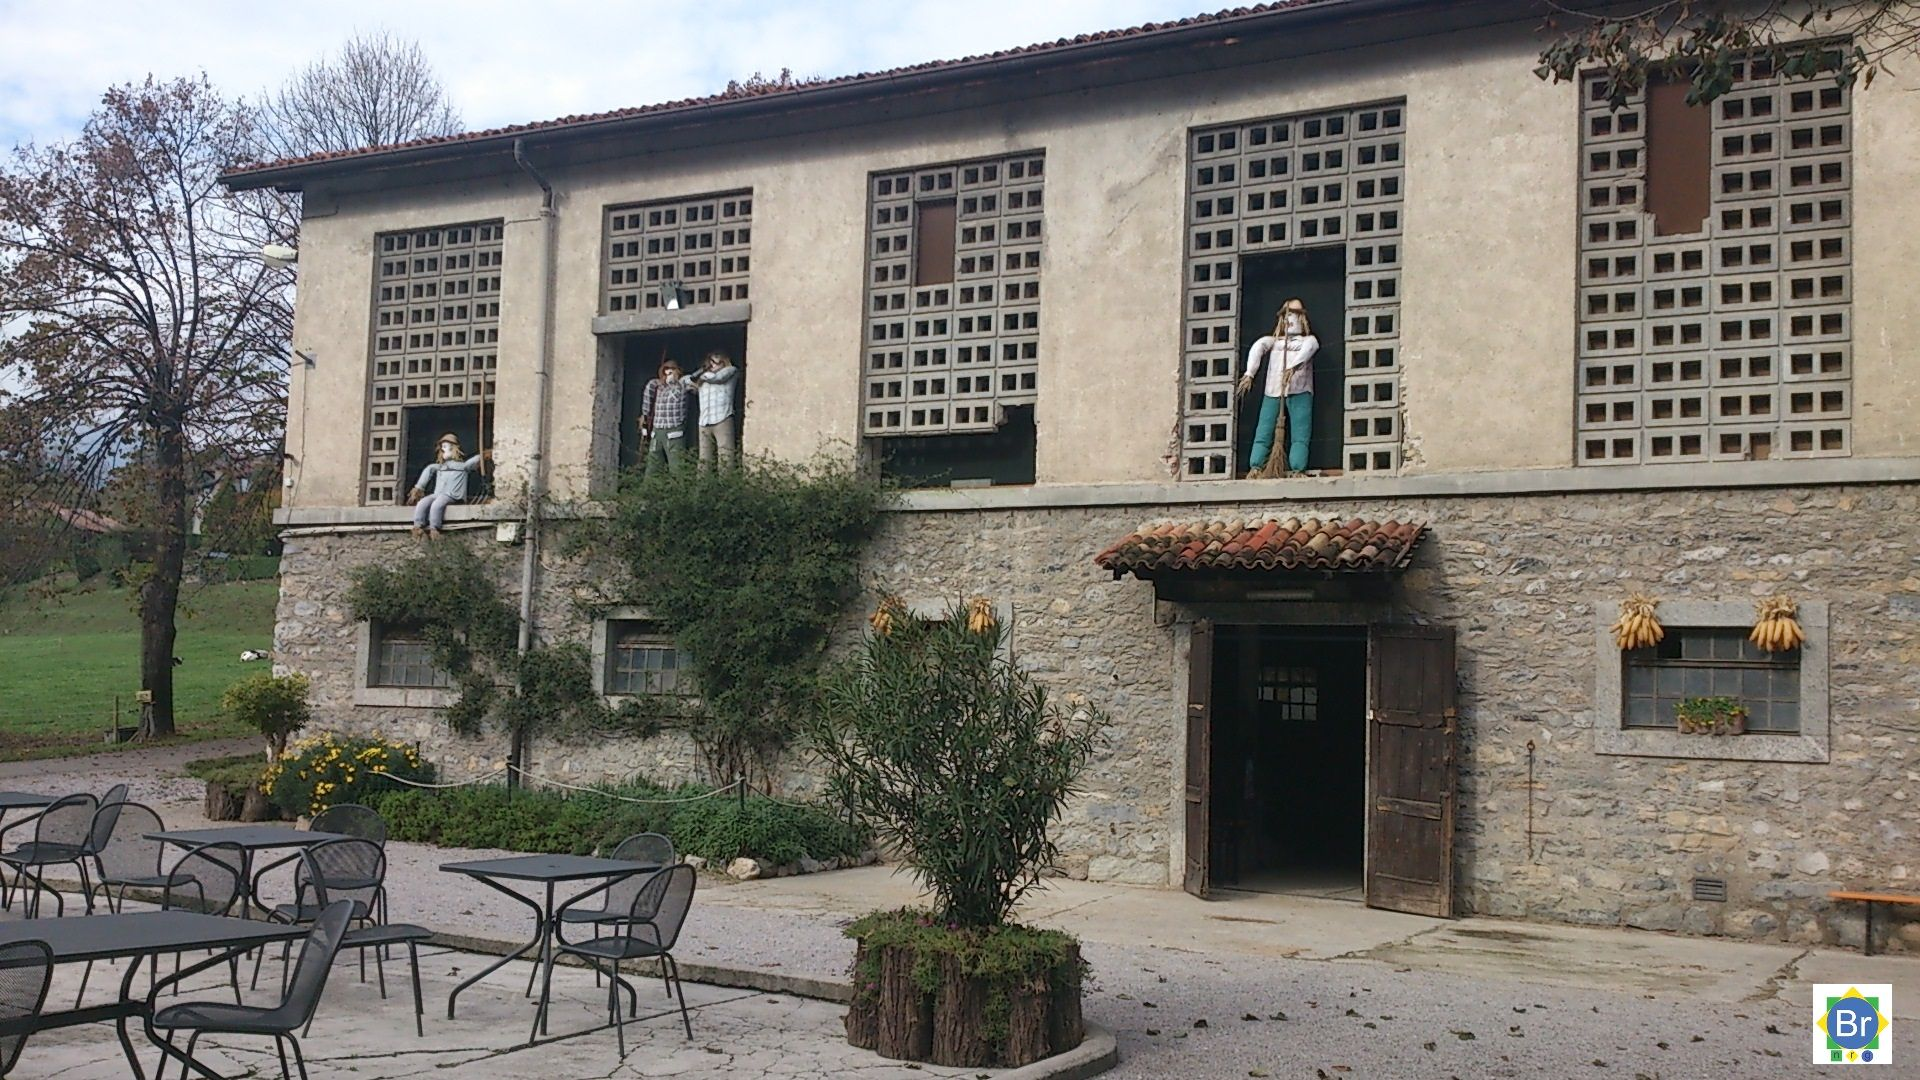 Fattoria Sant'Anna - Pusiano - Italy